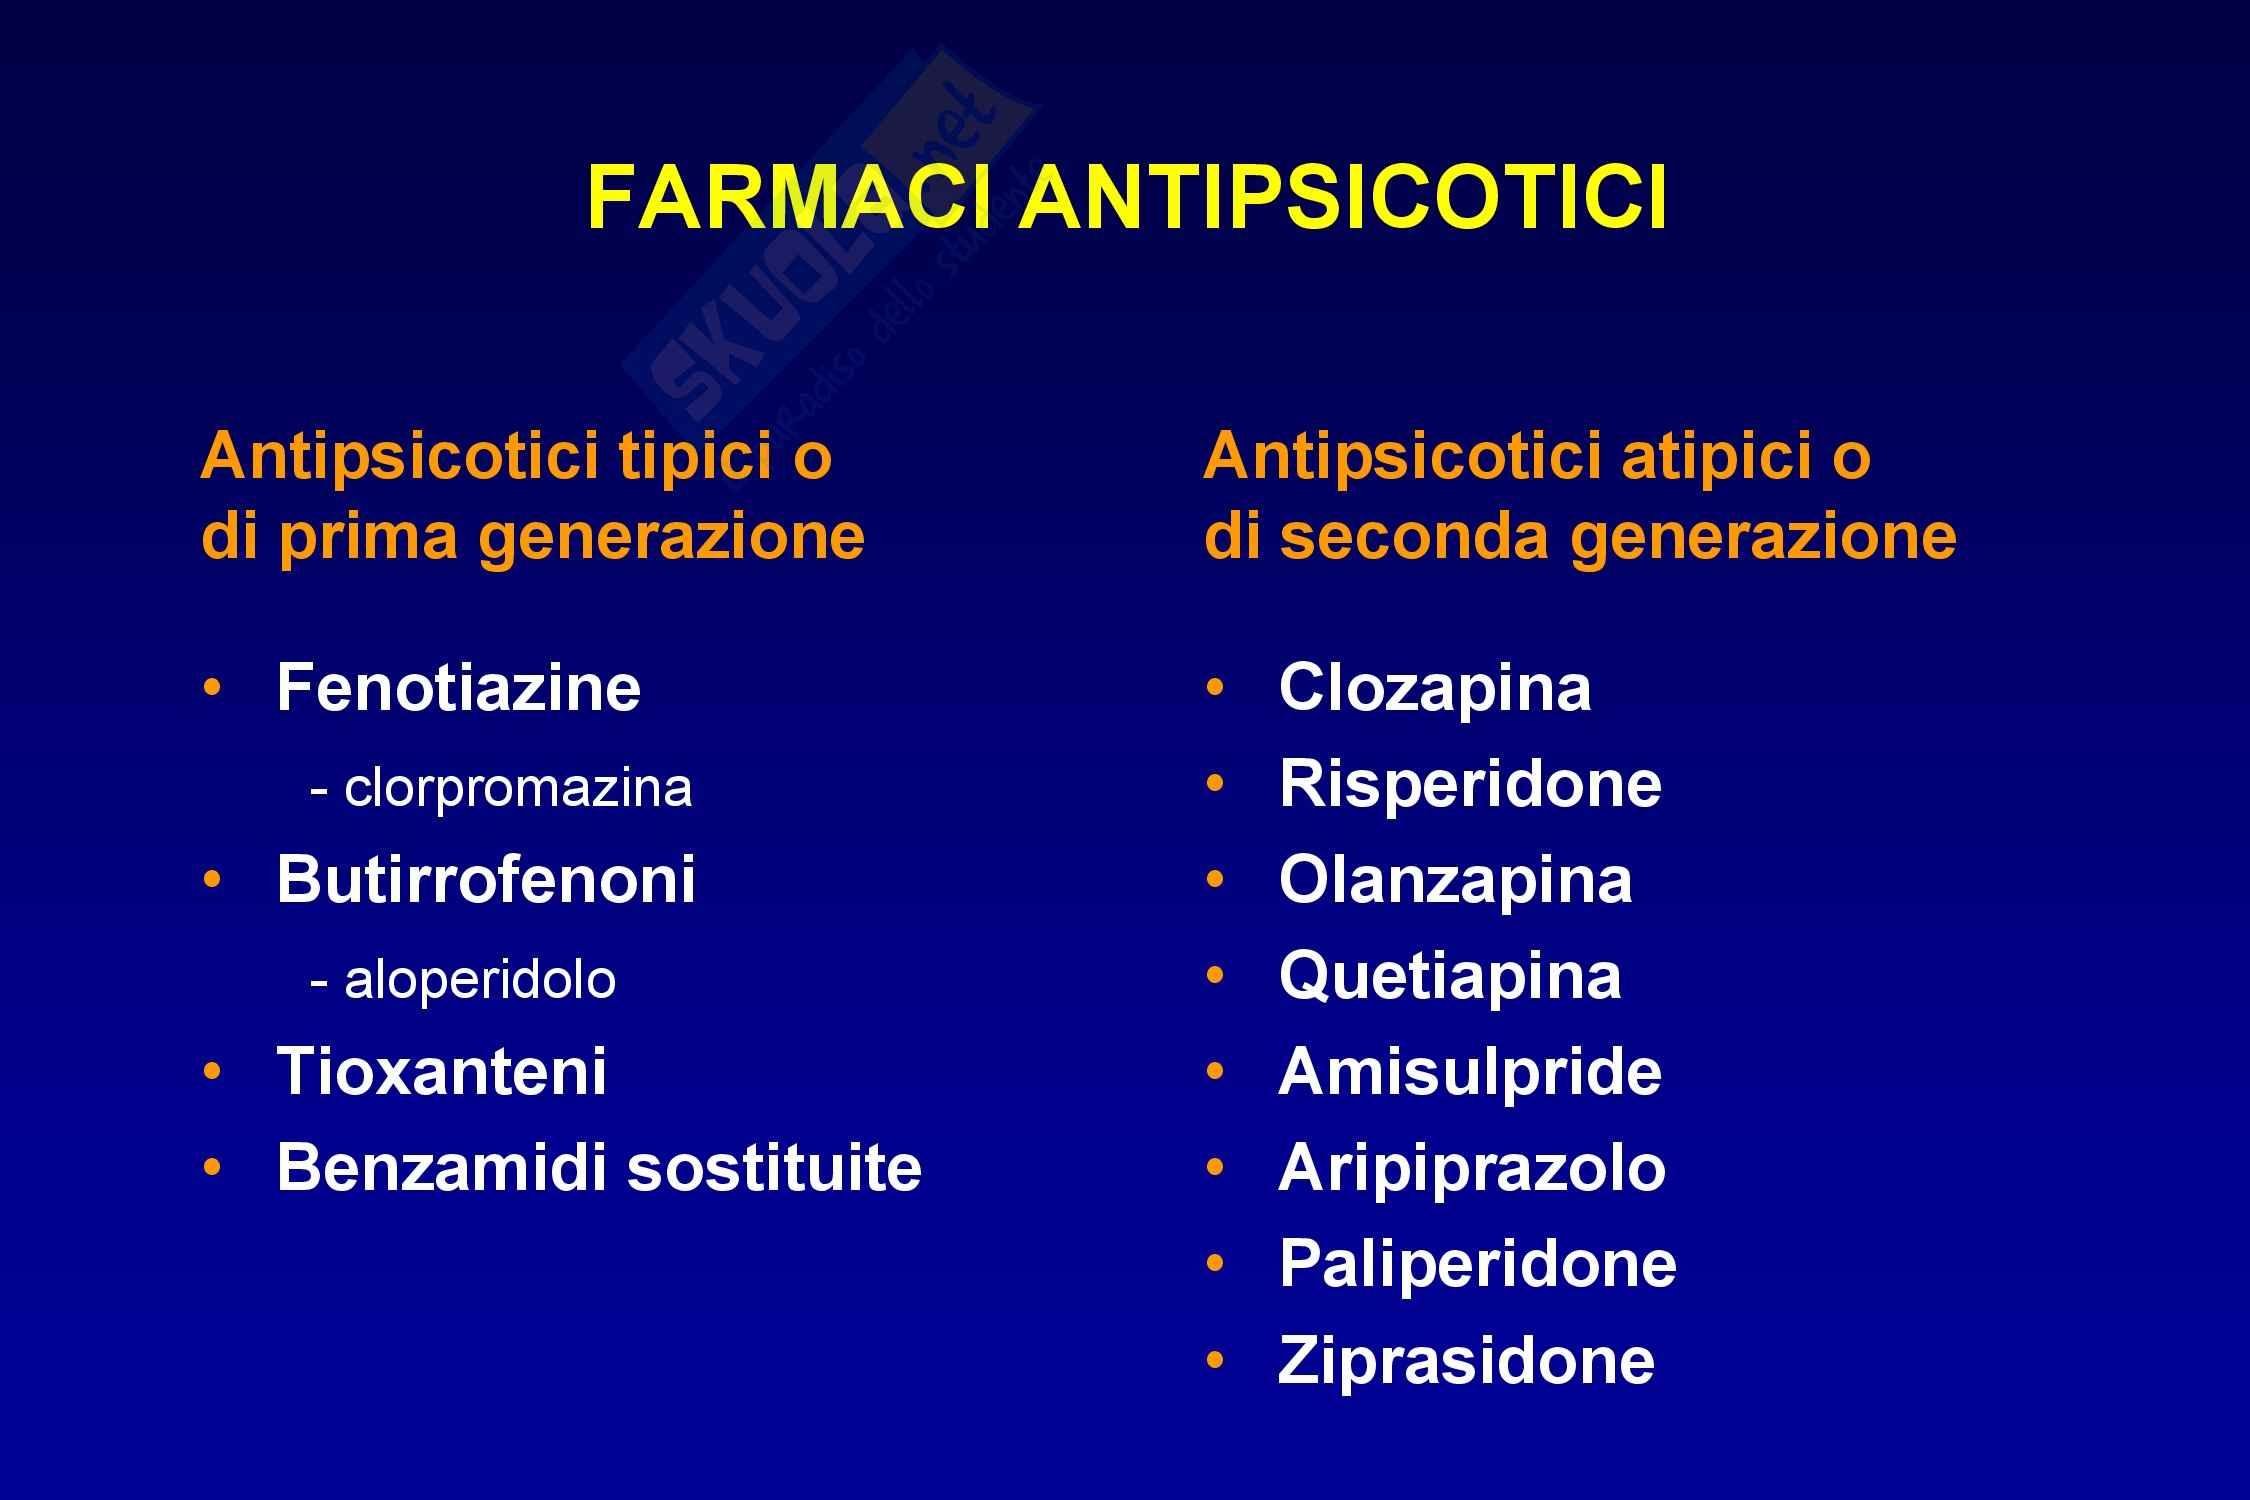 Farmaci antipsicotici Pag. 16